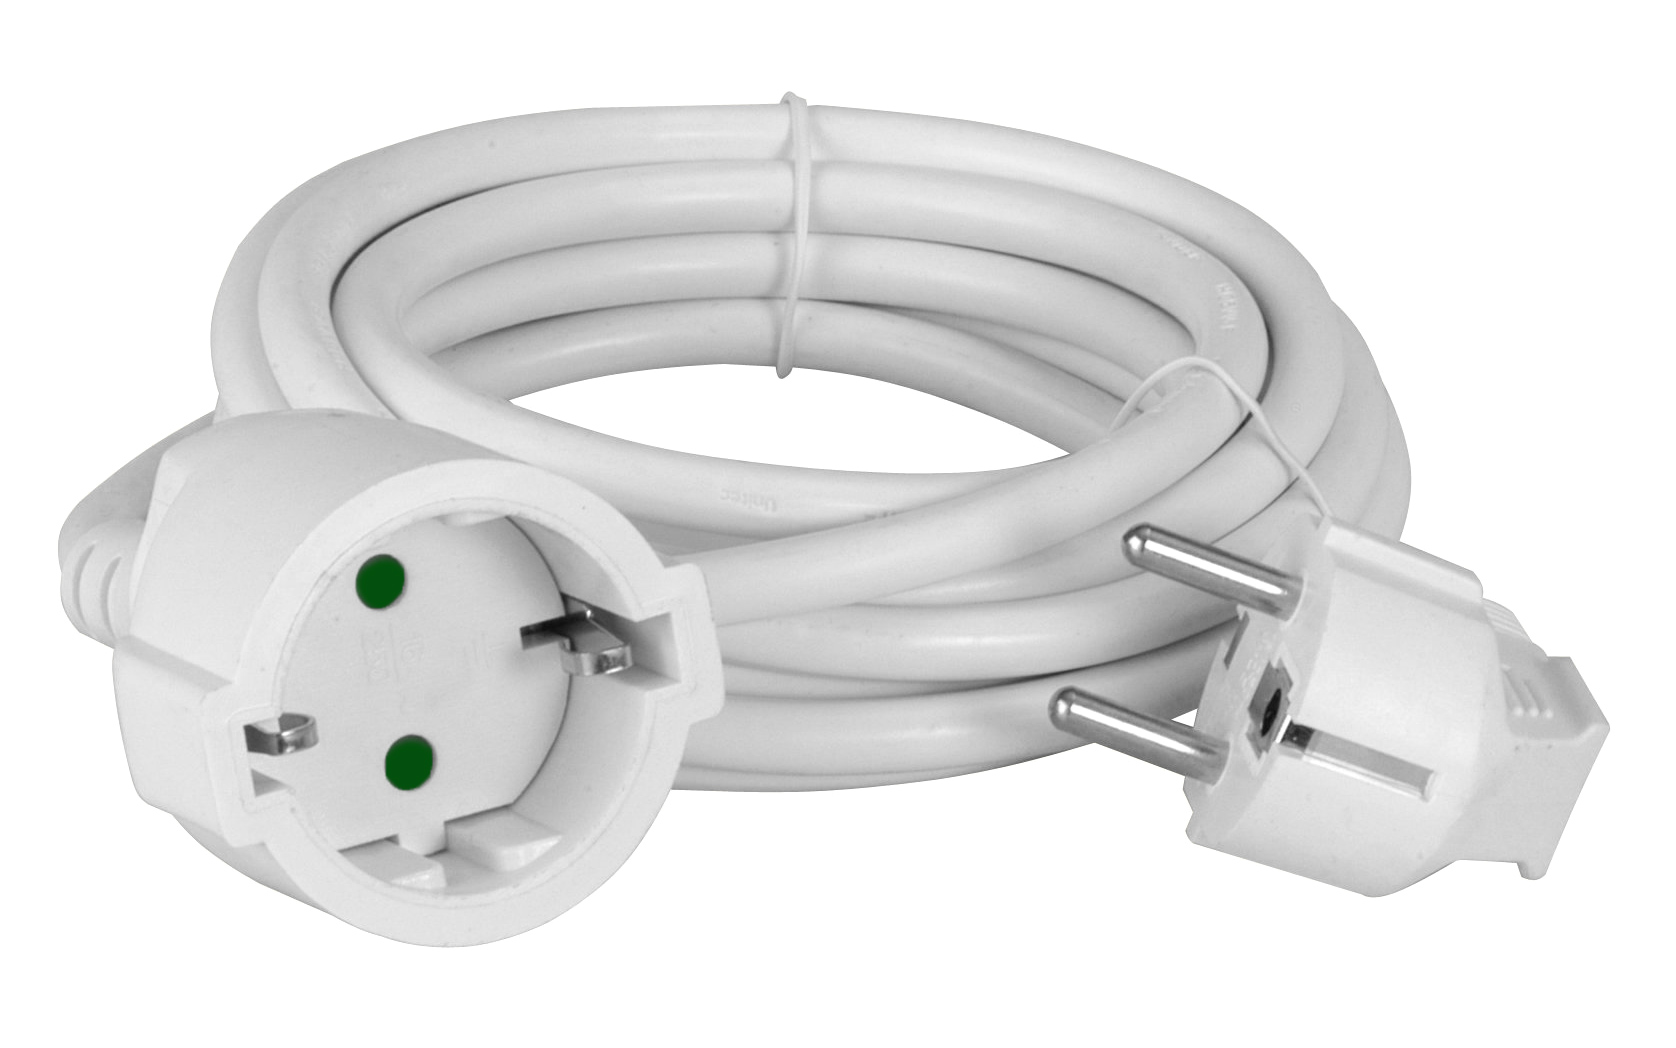 POWERTECH μπαλαντέζα ρεύματος PT-890, 1x schuko, 16A, 7m, λευκή - POWERTECH 36688